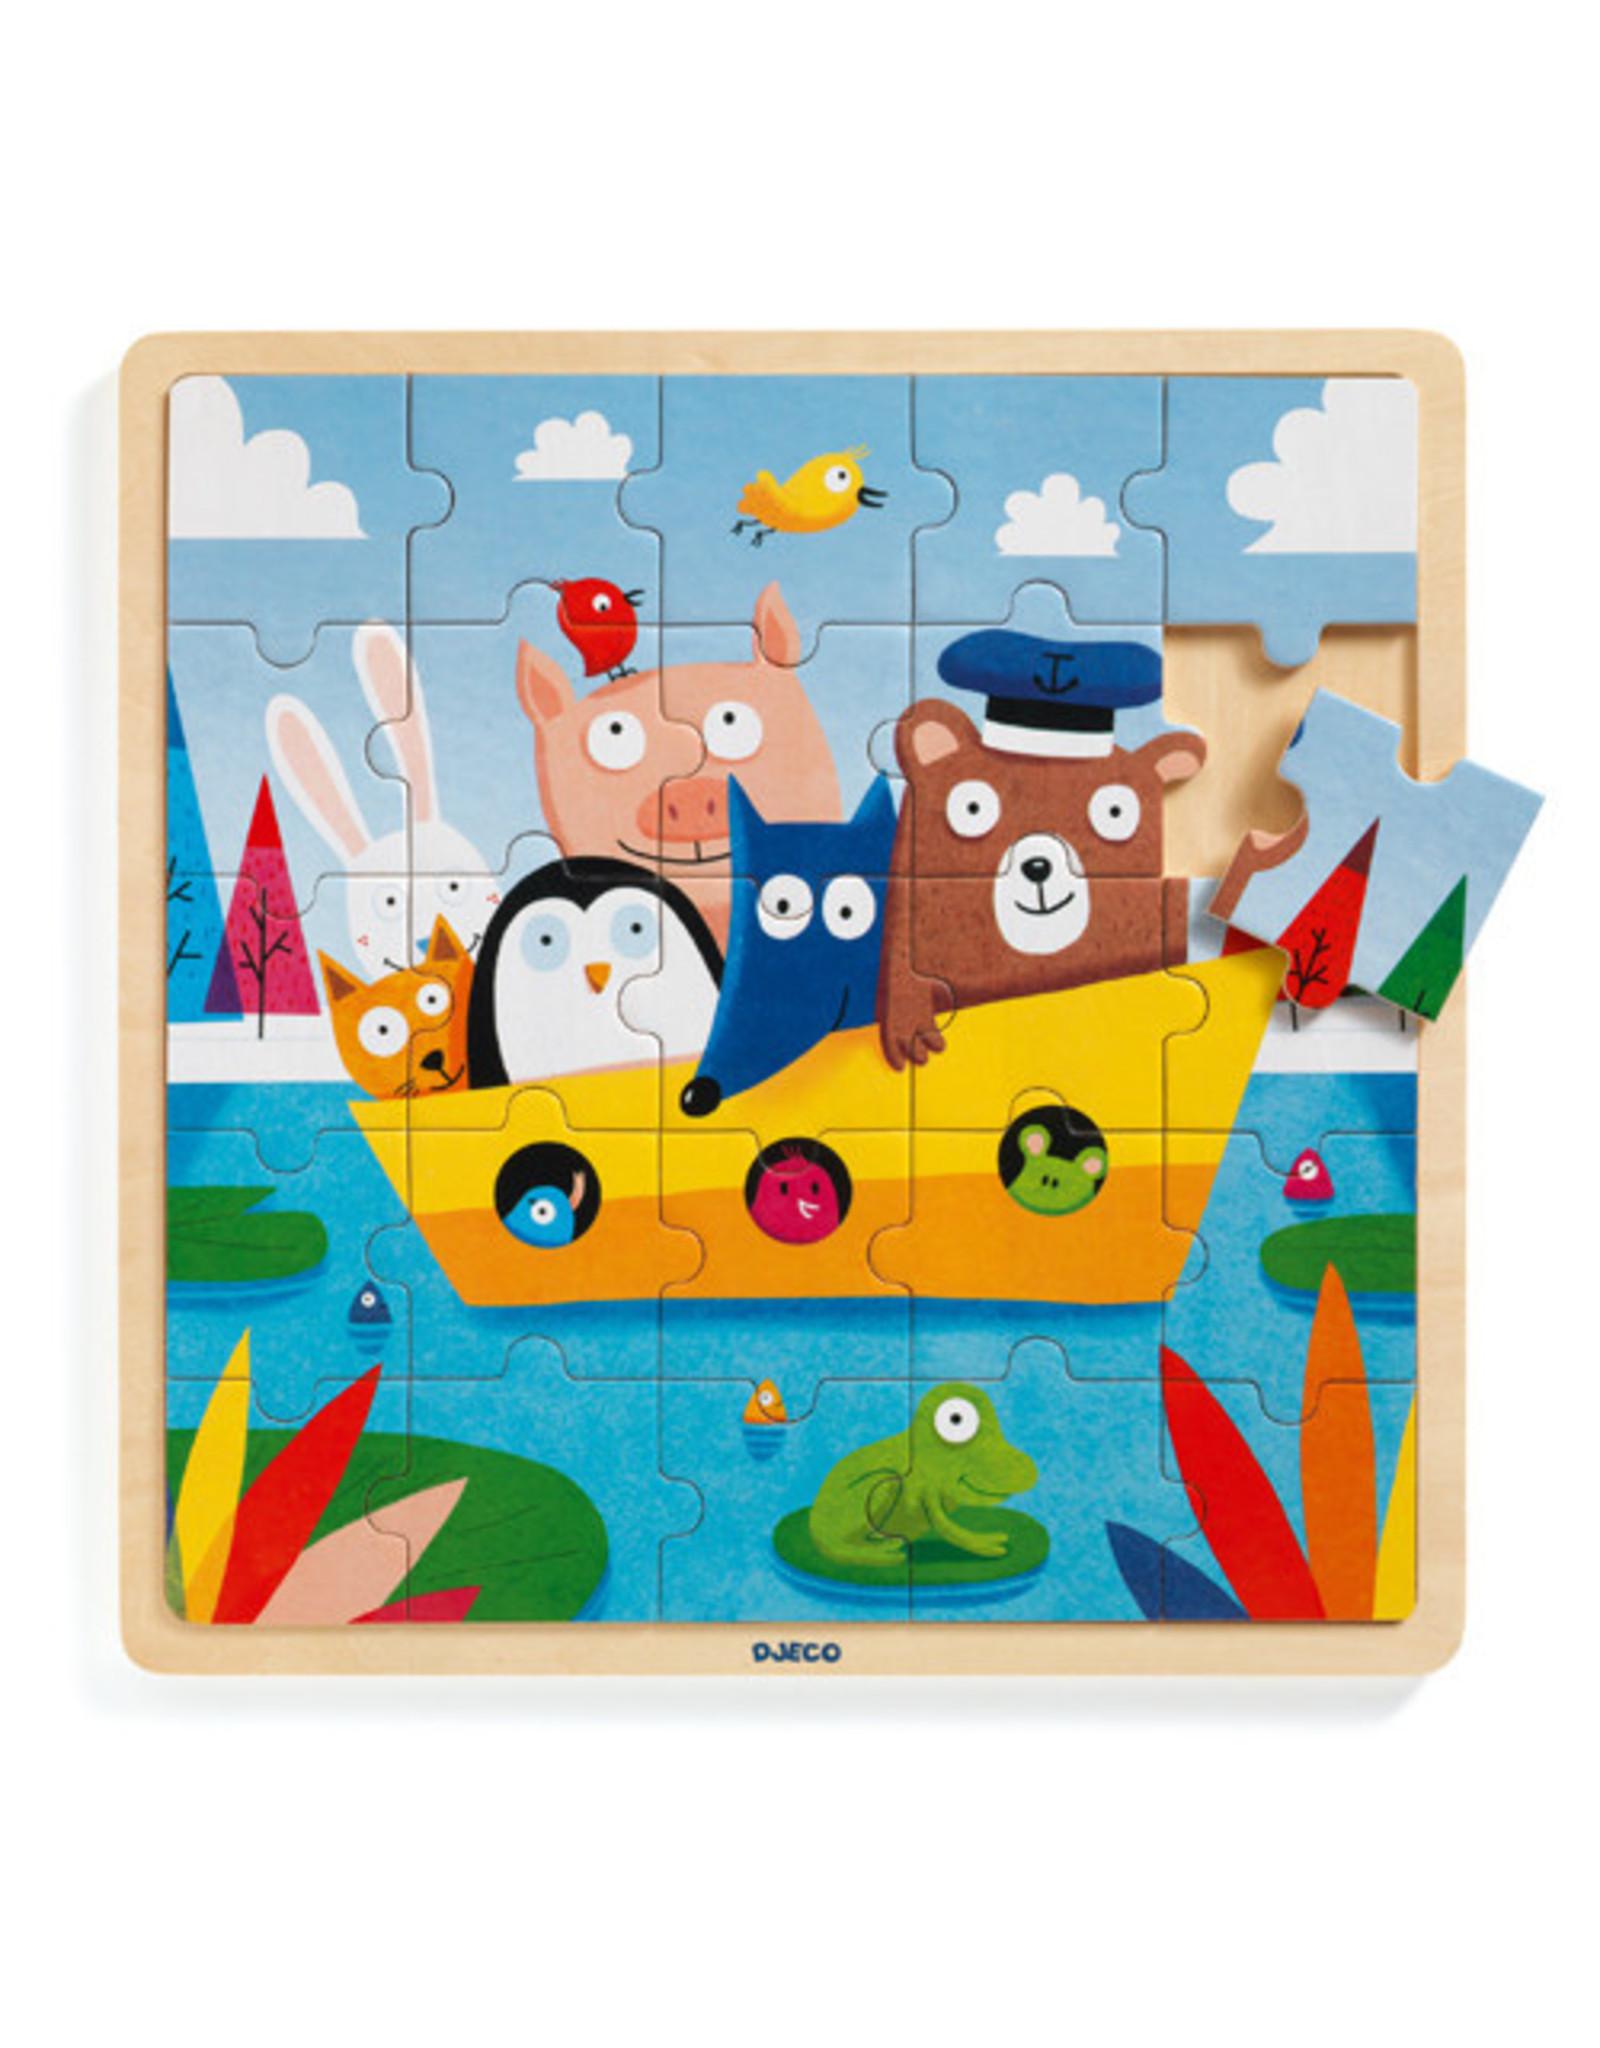 Djeco Wooden Puzzle, Puzzlo Boat, 25 pc